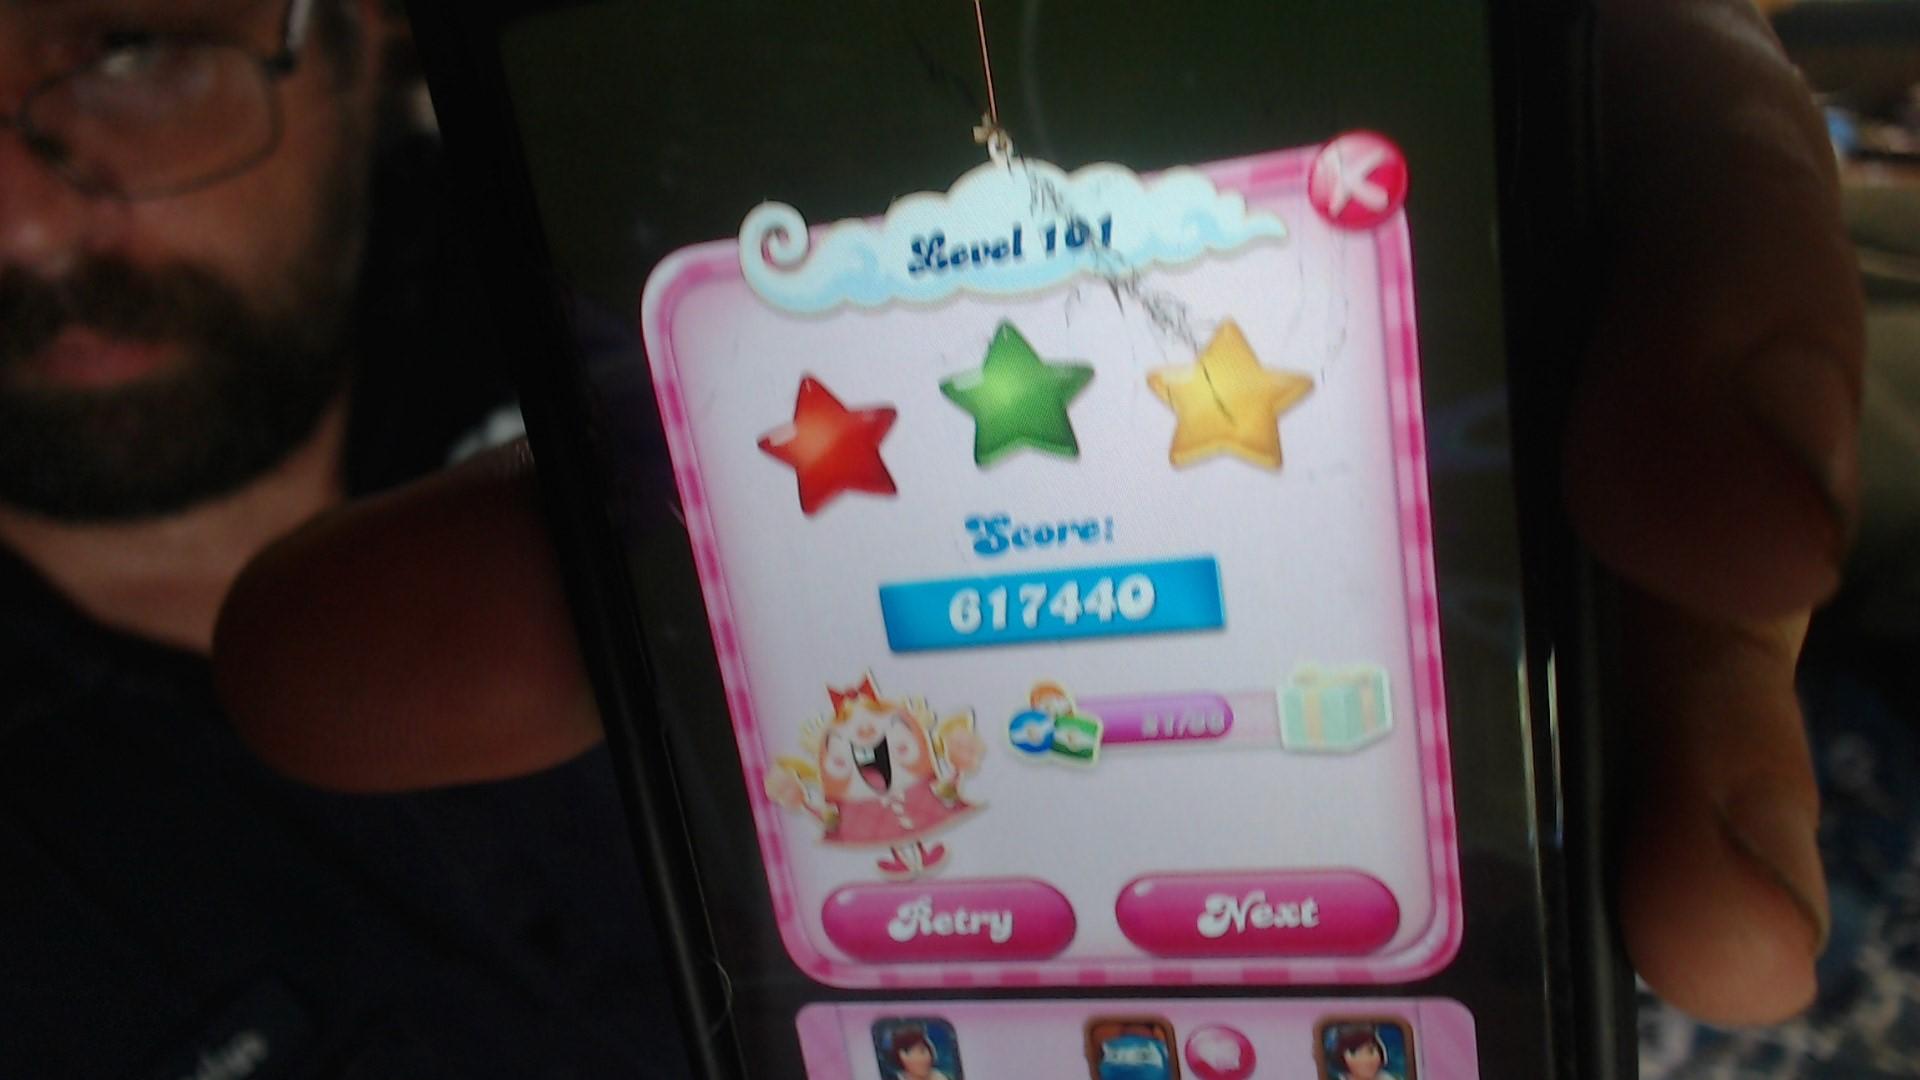 speedy4759123: Candy Crush Saga: Level 101 (iOS) 617,440 points on 2019-07-01 13:19:33